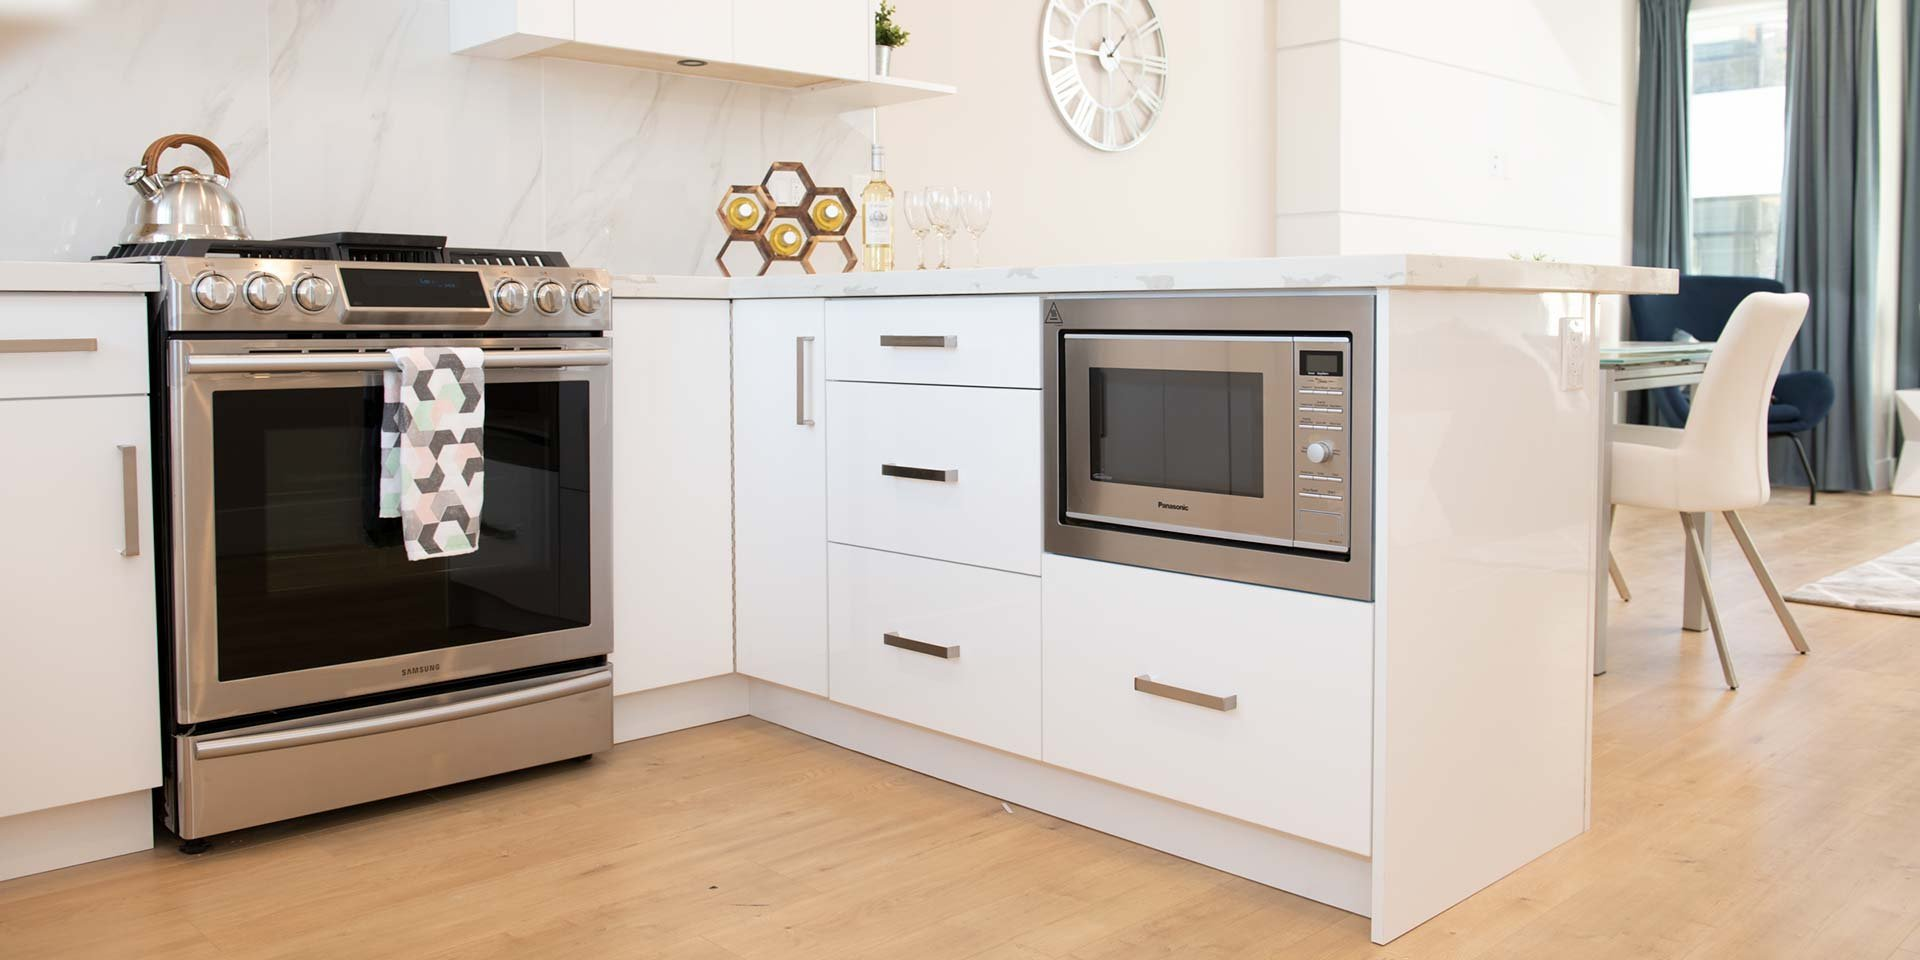 Kitchen - 16511 Watson Dr, Surrey, BC V4N 6T7, Canada!